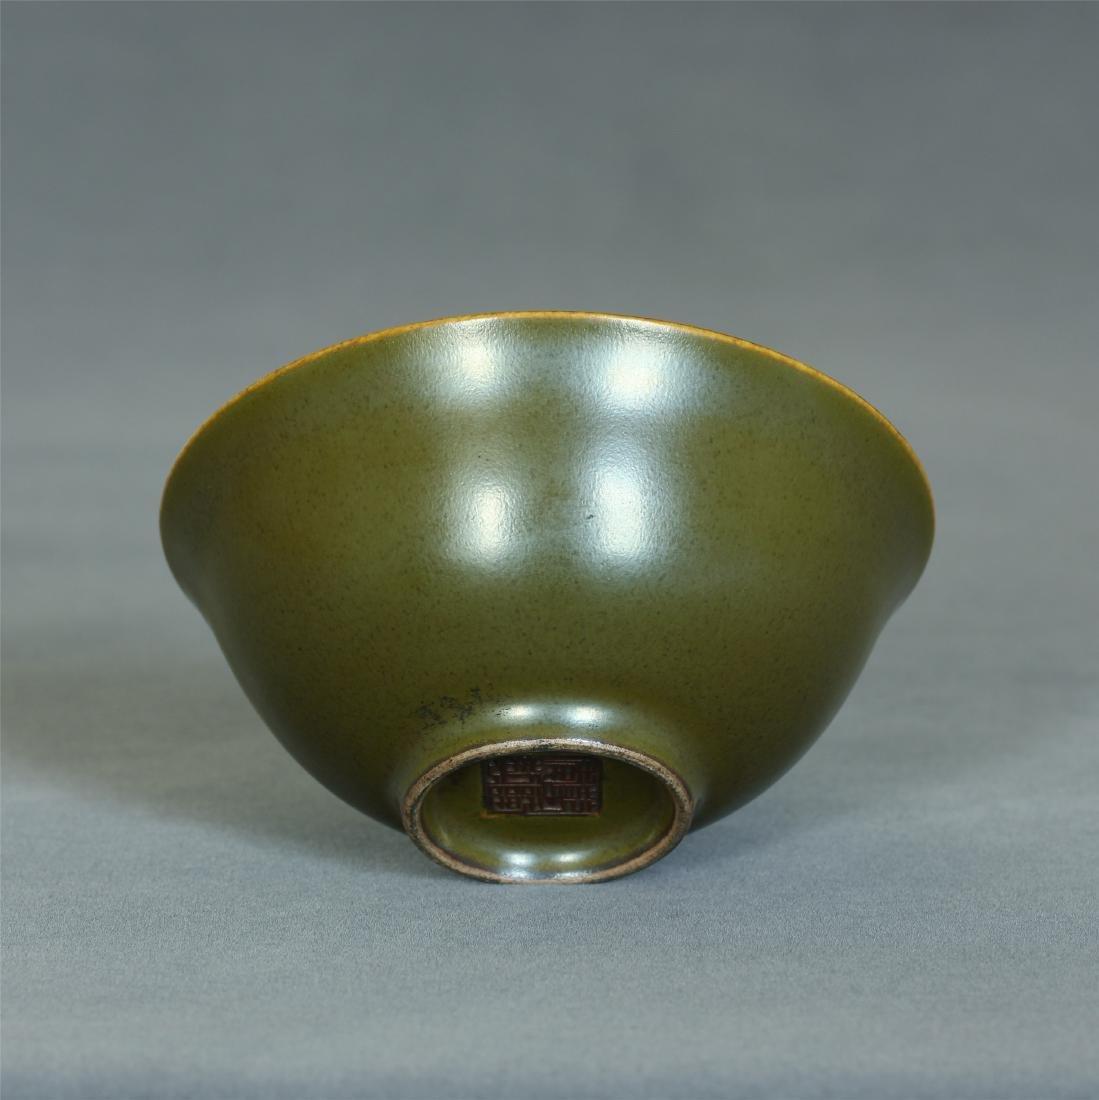 Tea glaze porcelain small bowl of Qing Dynasty QianLong - 9